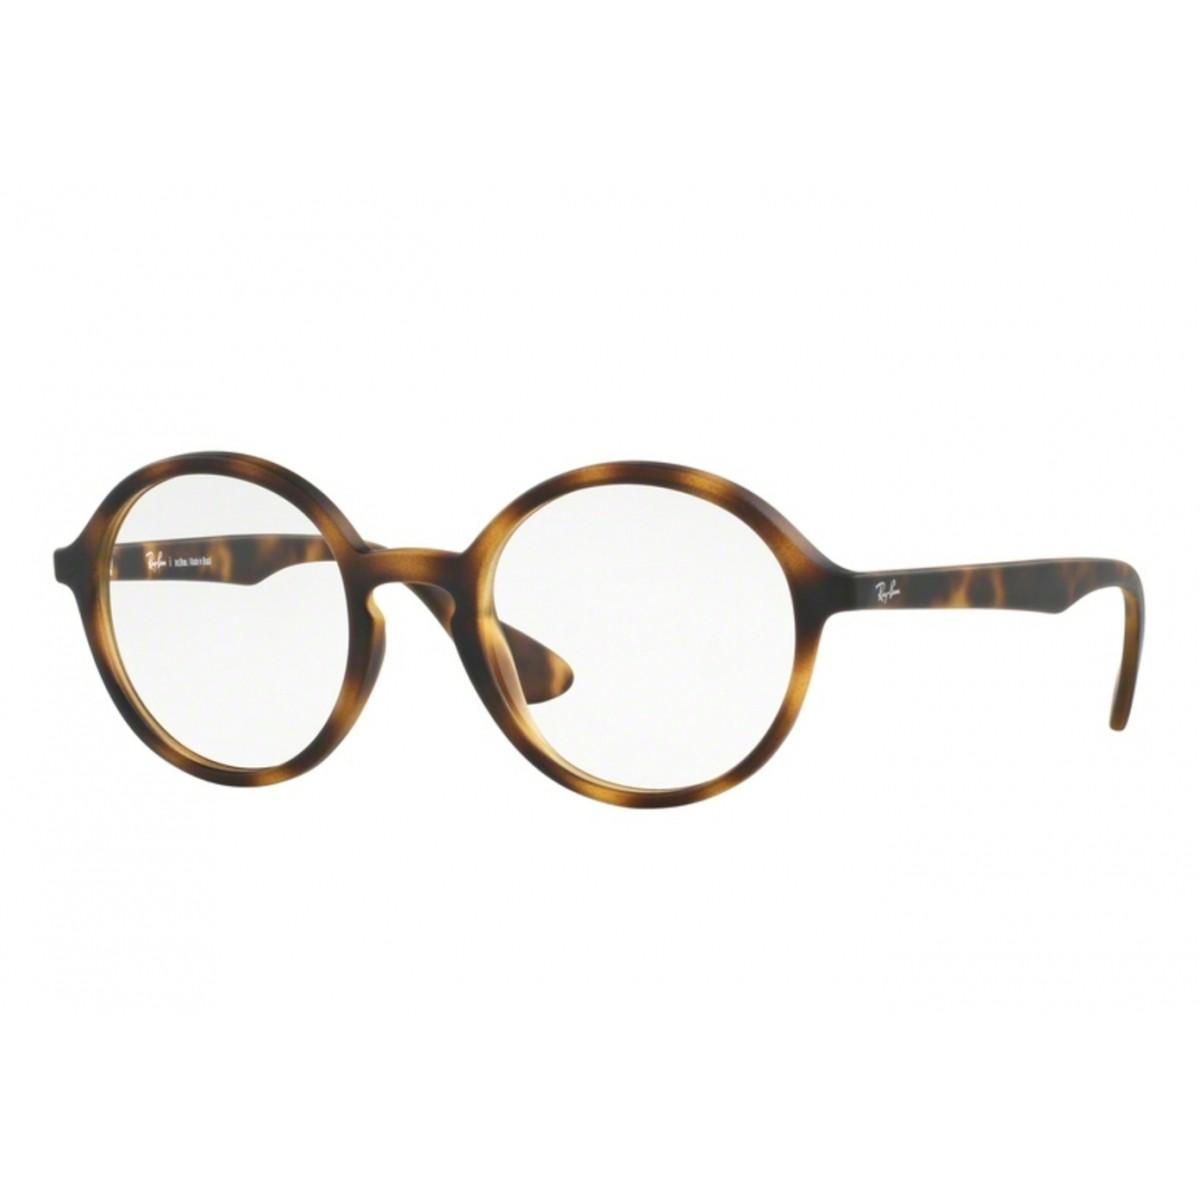 32746d31ed3fd Óculos de Grau Ray Ban Round Redondo RB7075L 5365 Tam.47Ray Ban ...